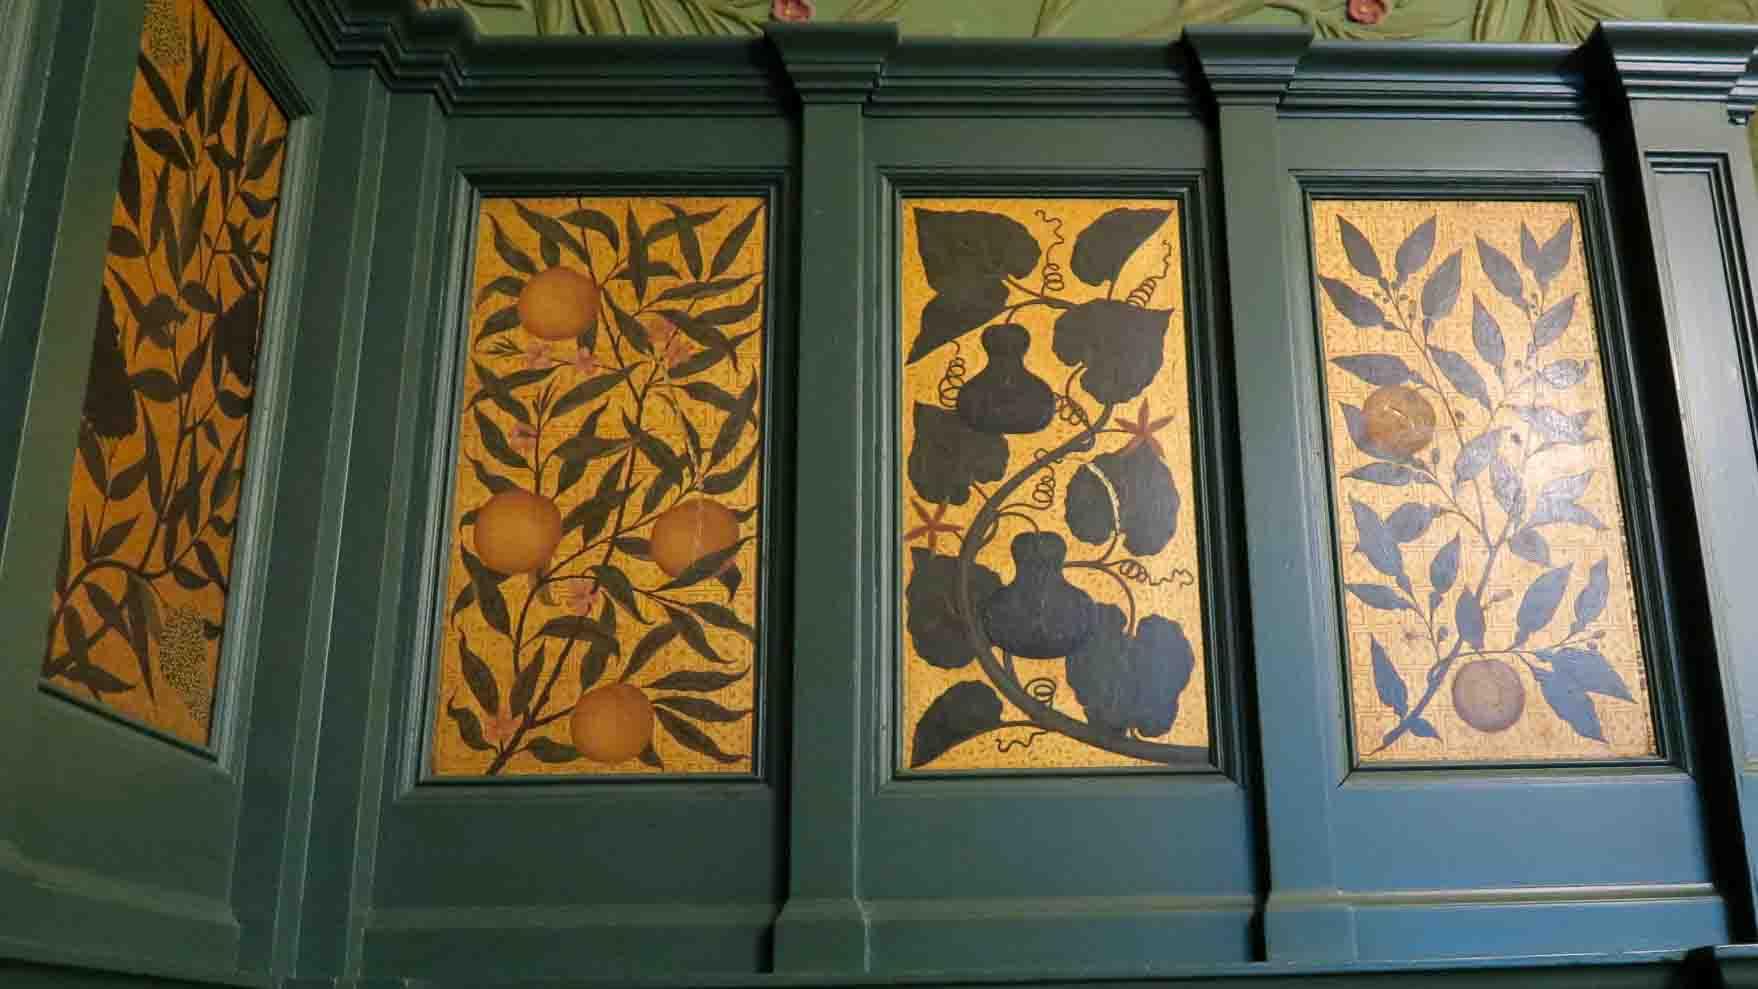 Morris room at the victoria amp albert museum london motrlt